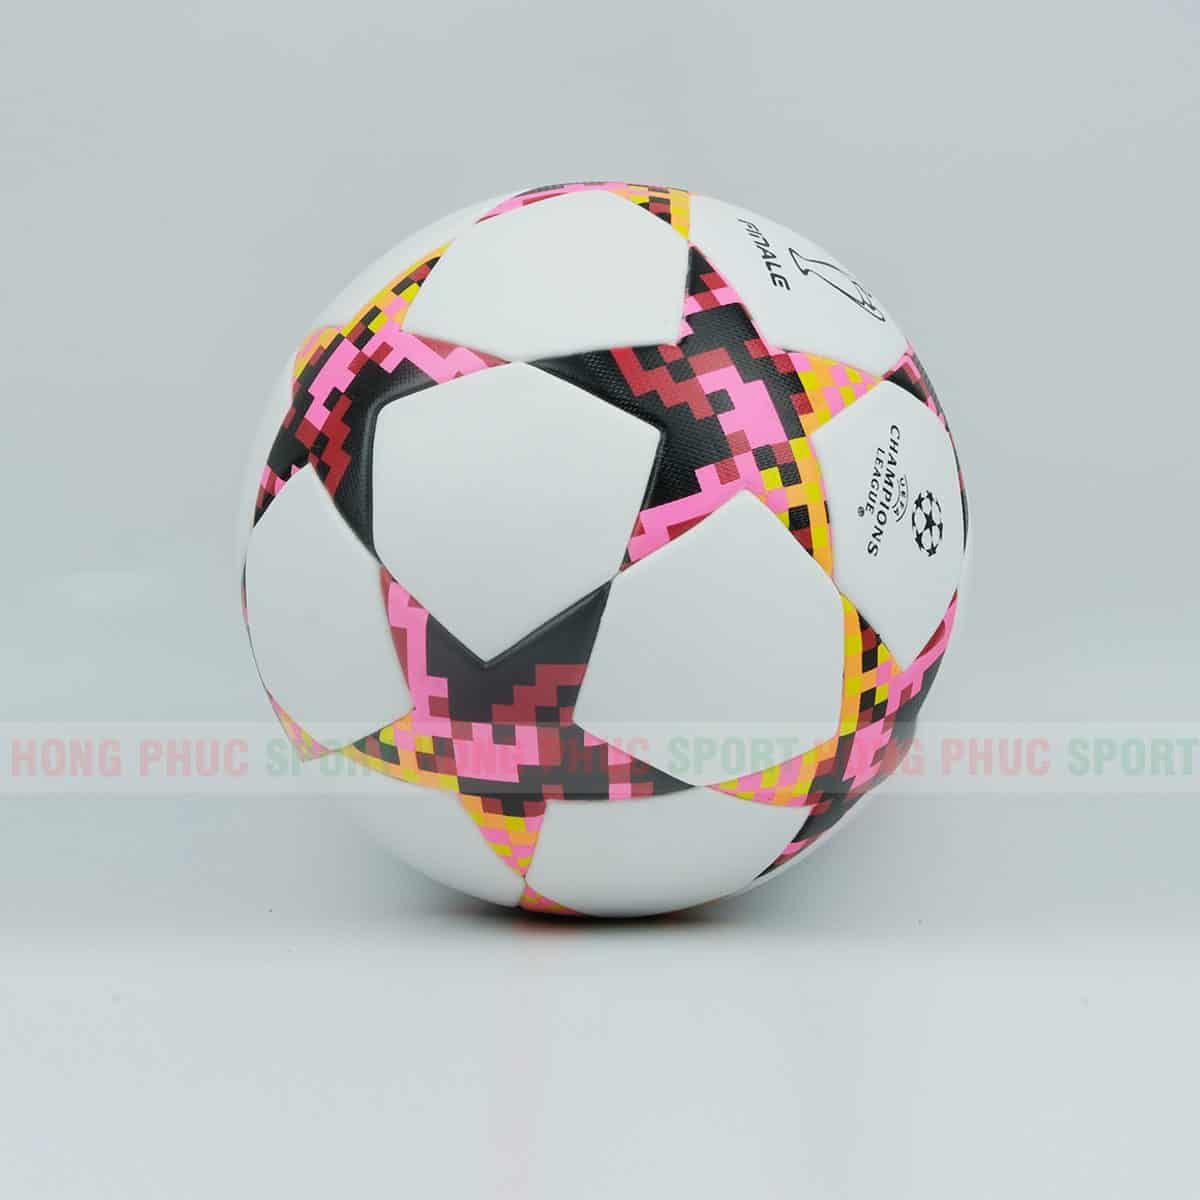 https://cdn.hongphucsport.com/unsafe/cdn.hongphucsport.com/dothethao.net.vn/wp-content/uploads/2019/09/bong-da-uefa-champions-league-2019-xanh-mau-4-tang-kim-bom.jpg